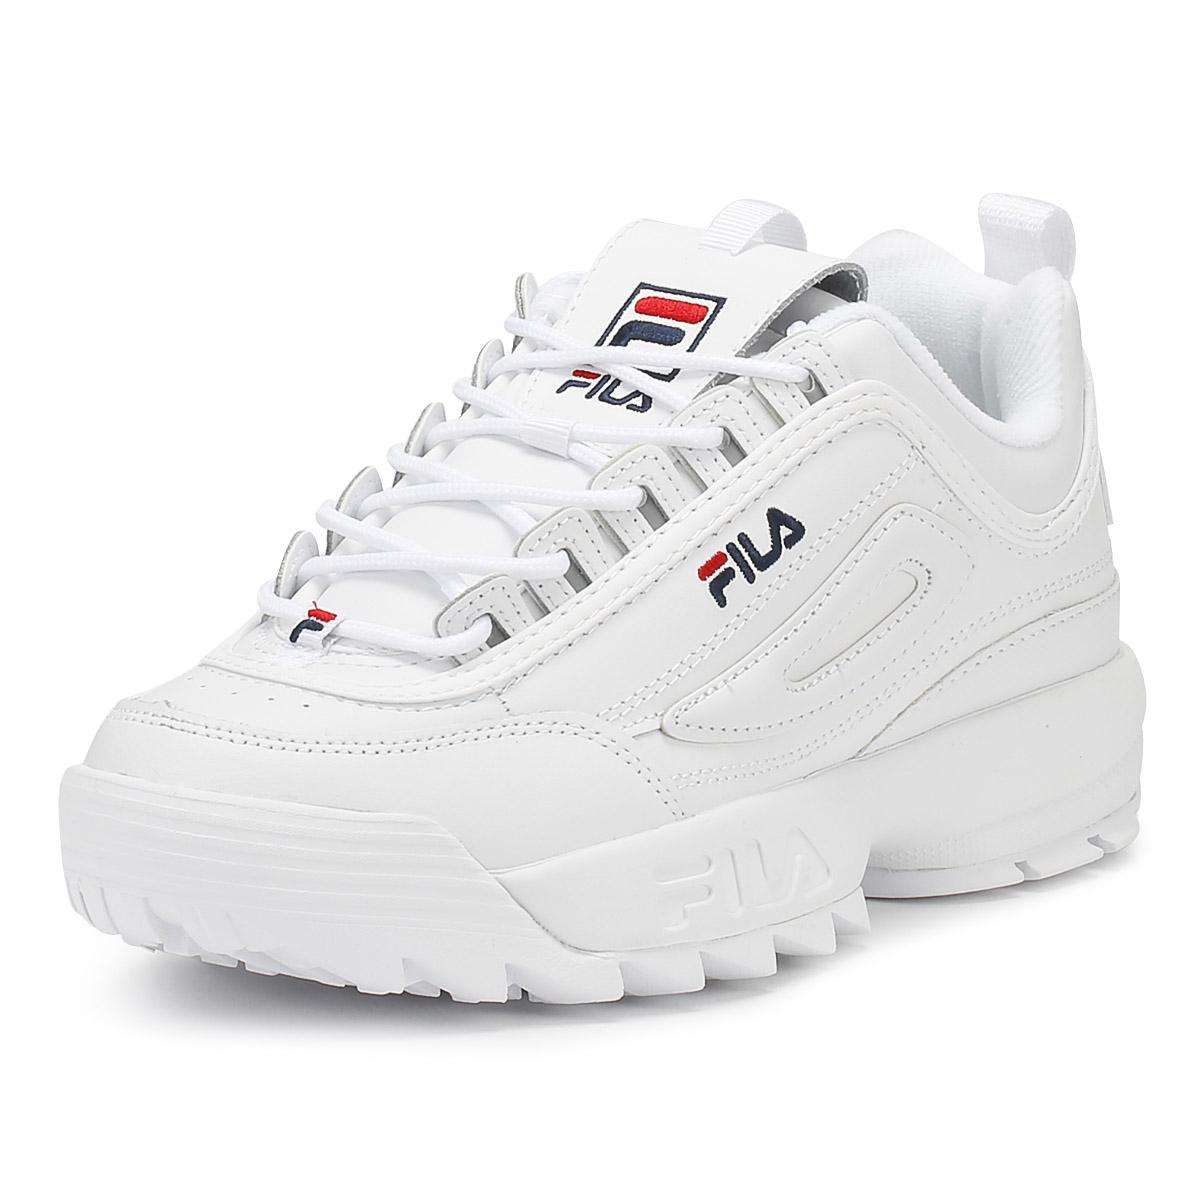 fila womens trainers white disruptor ii premium sport